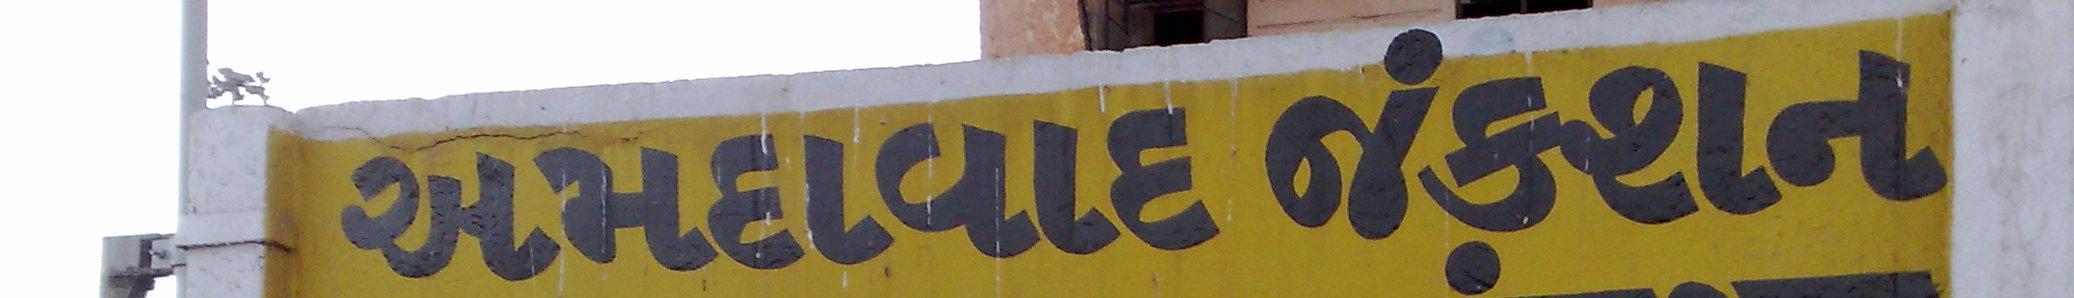 Gujarati phrasebook – Travel guide at Wikivoyage